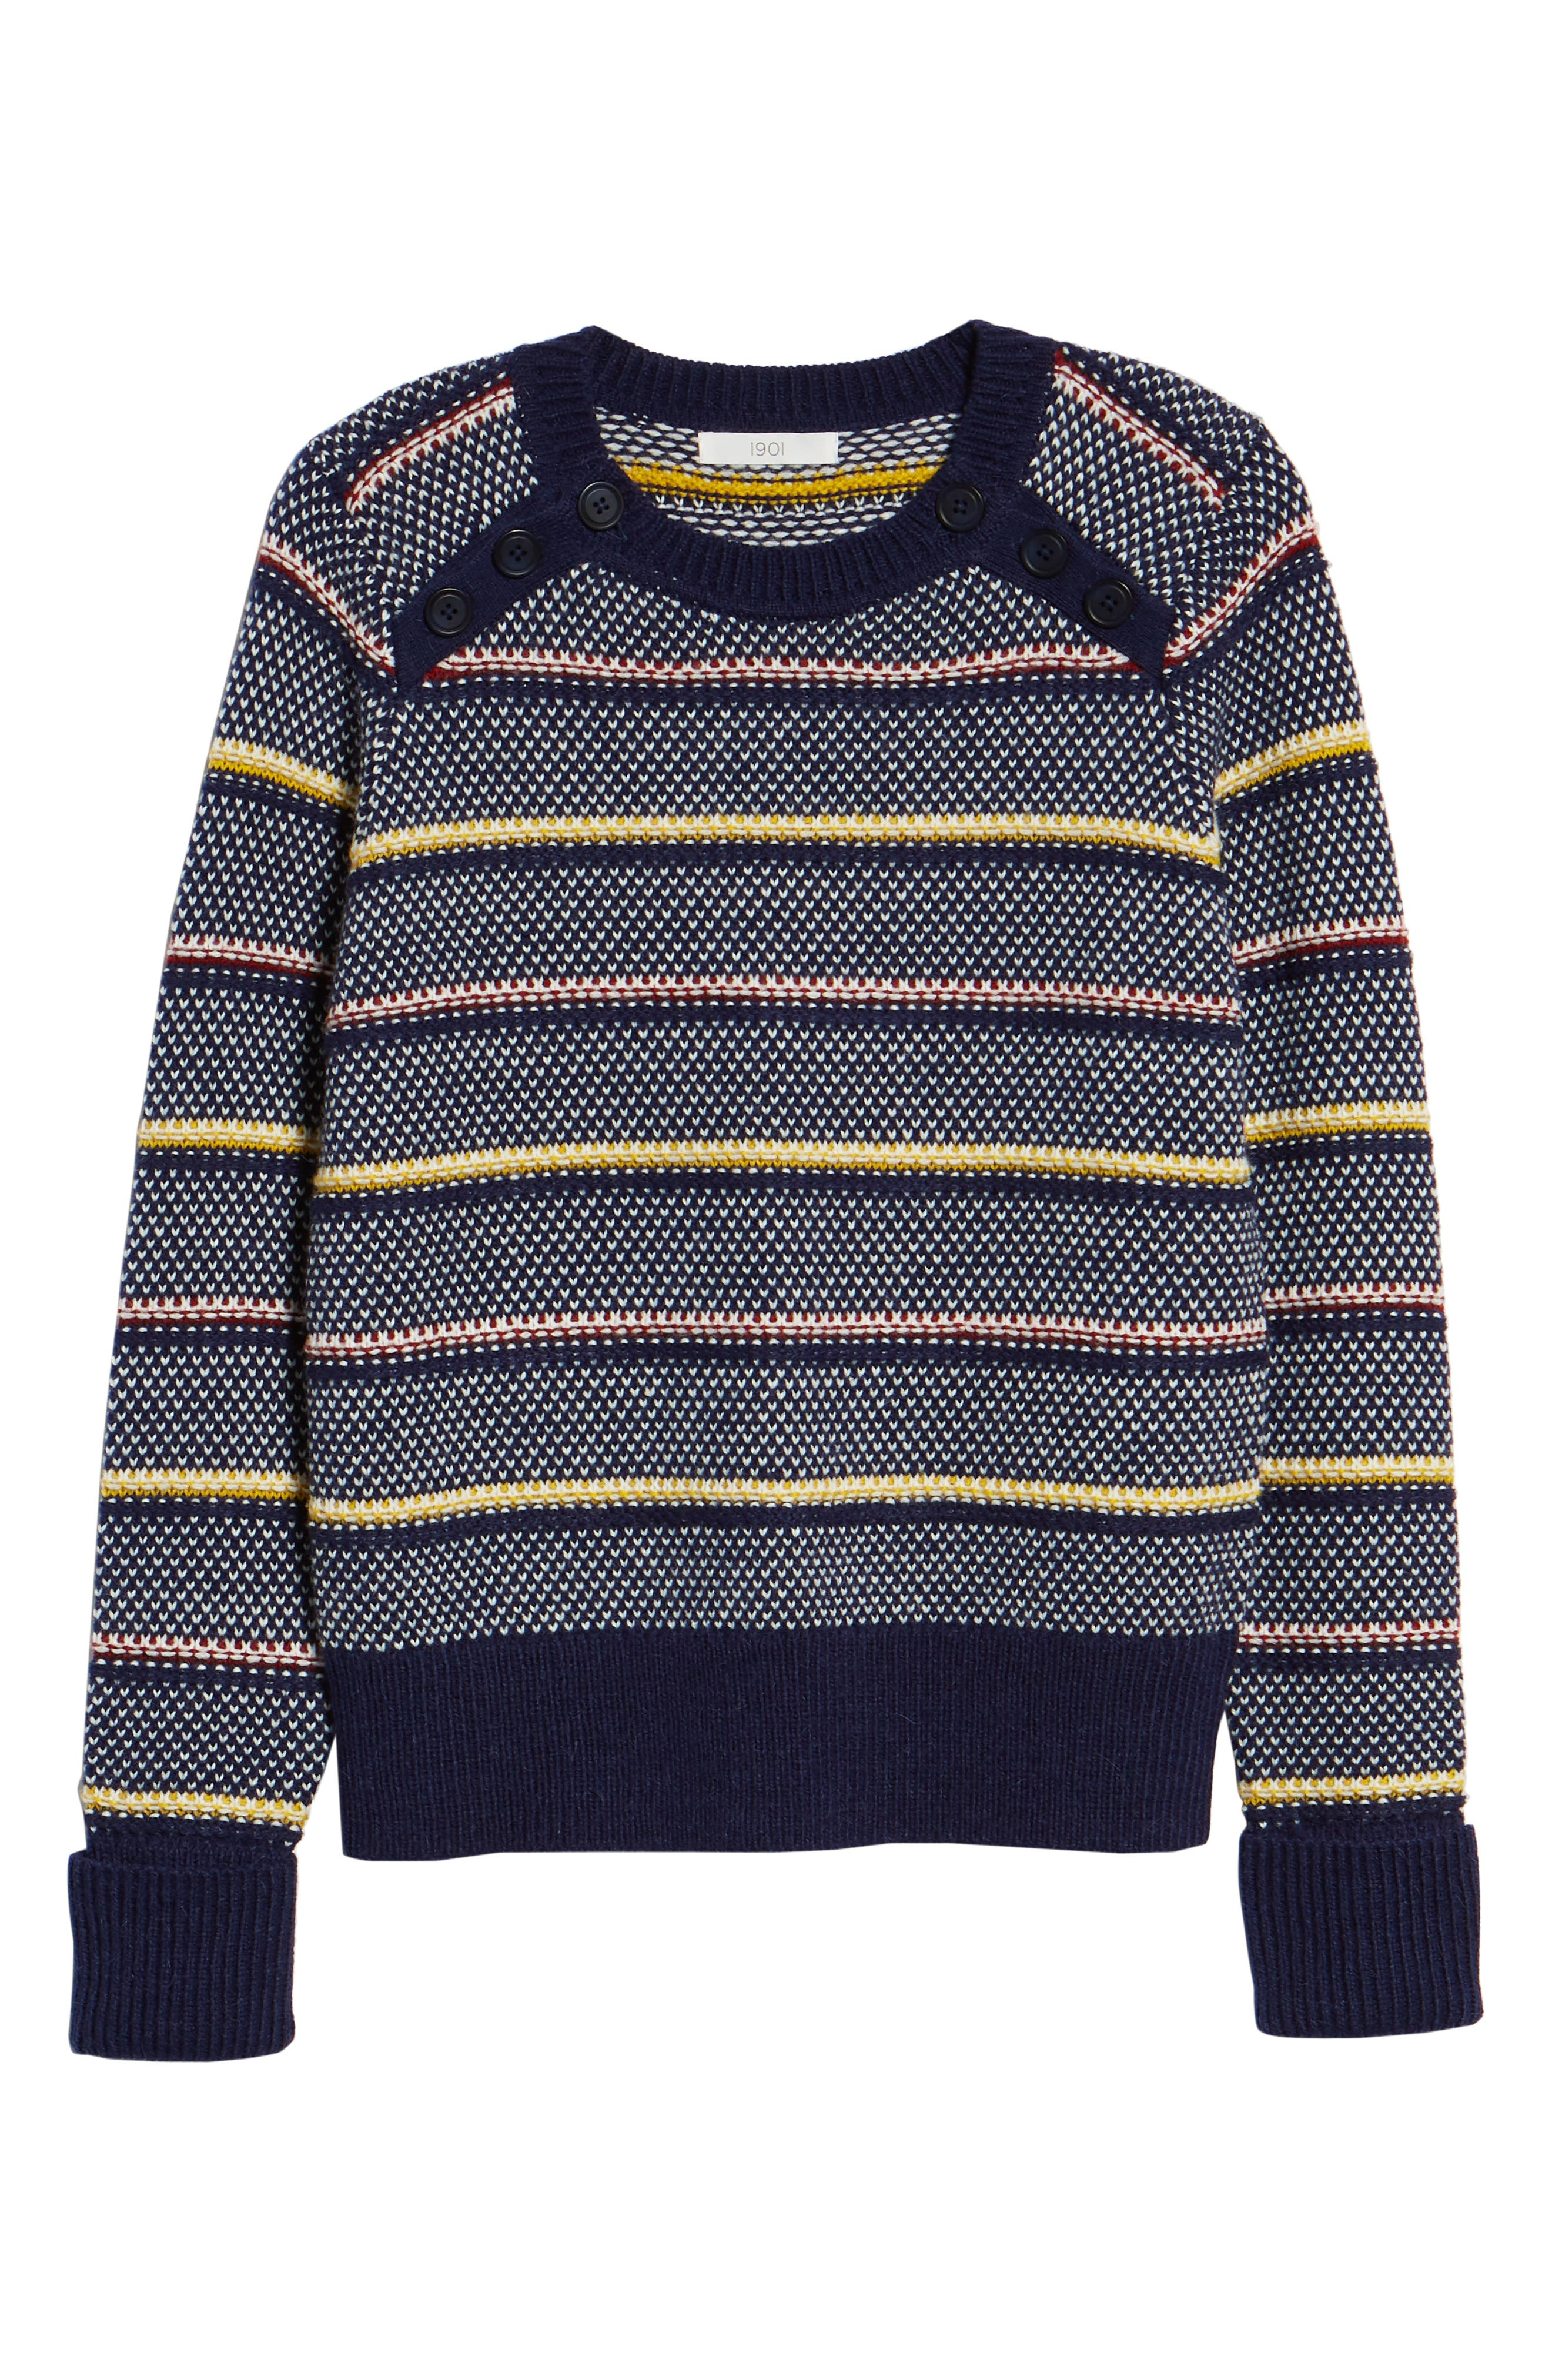 Button Detail Stripe Wool Blend Texture Sweater,                             Alternate thumbnail 6, color,                             NAVY BERET PATTERN